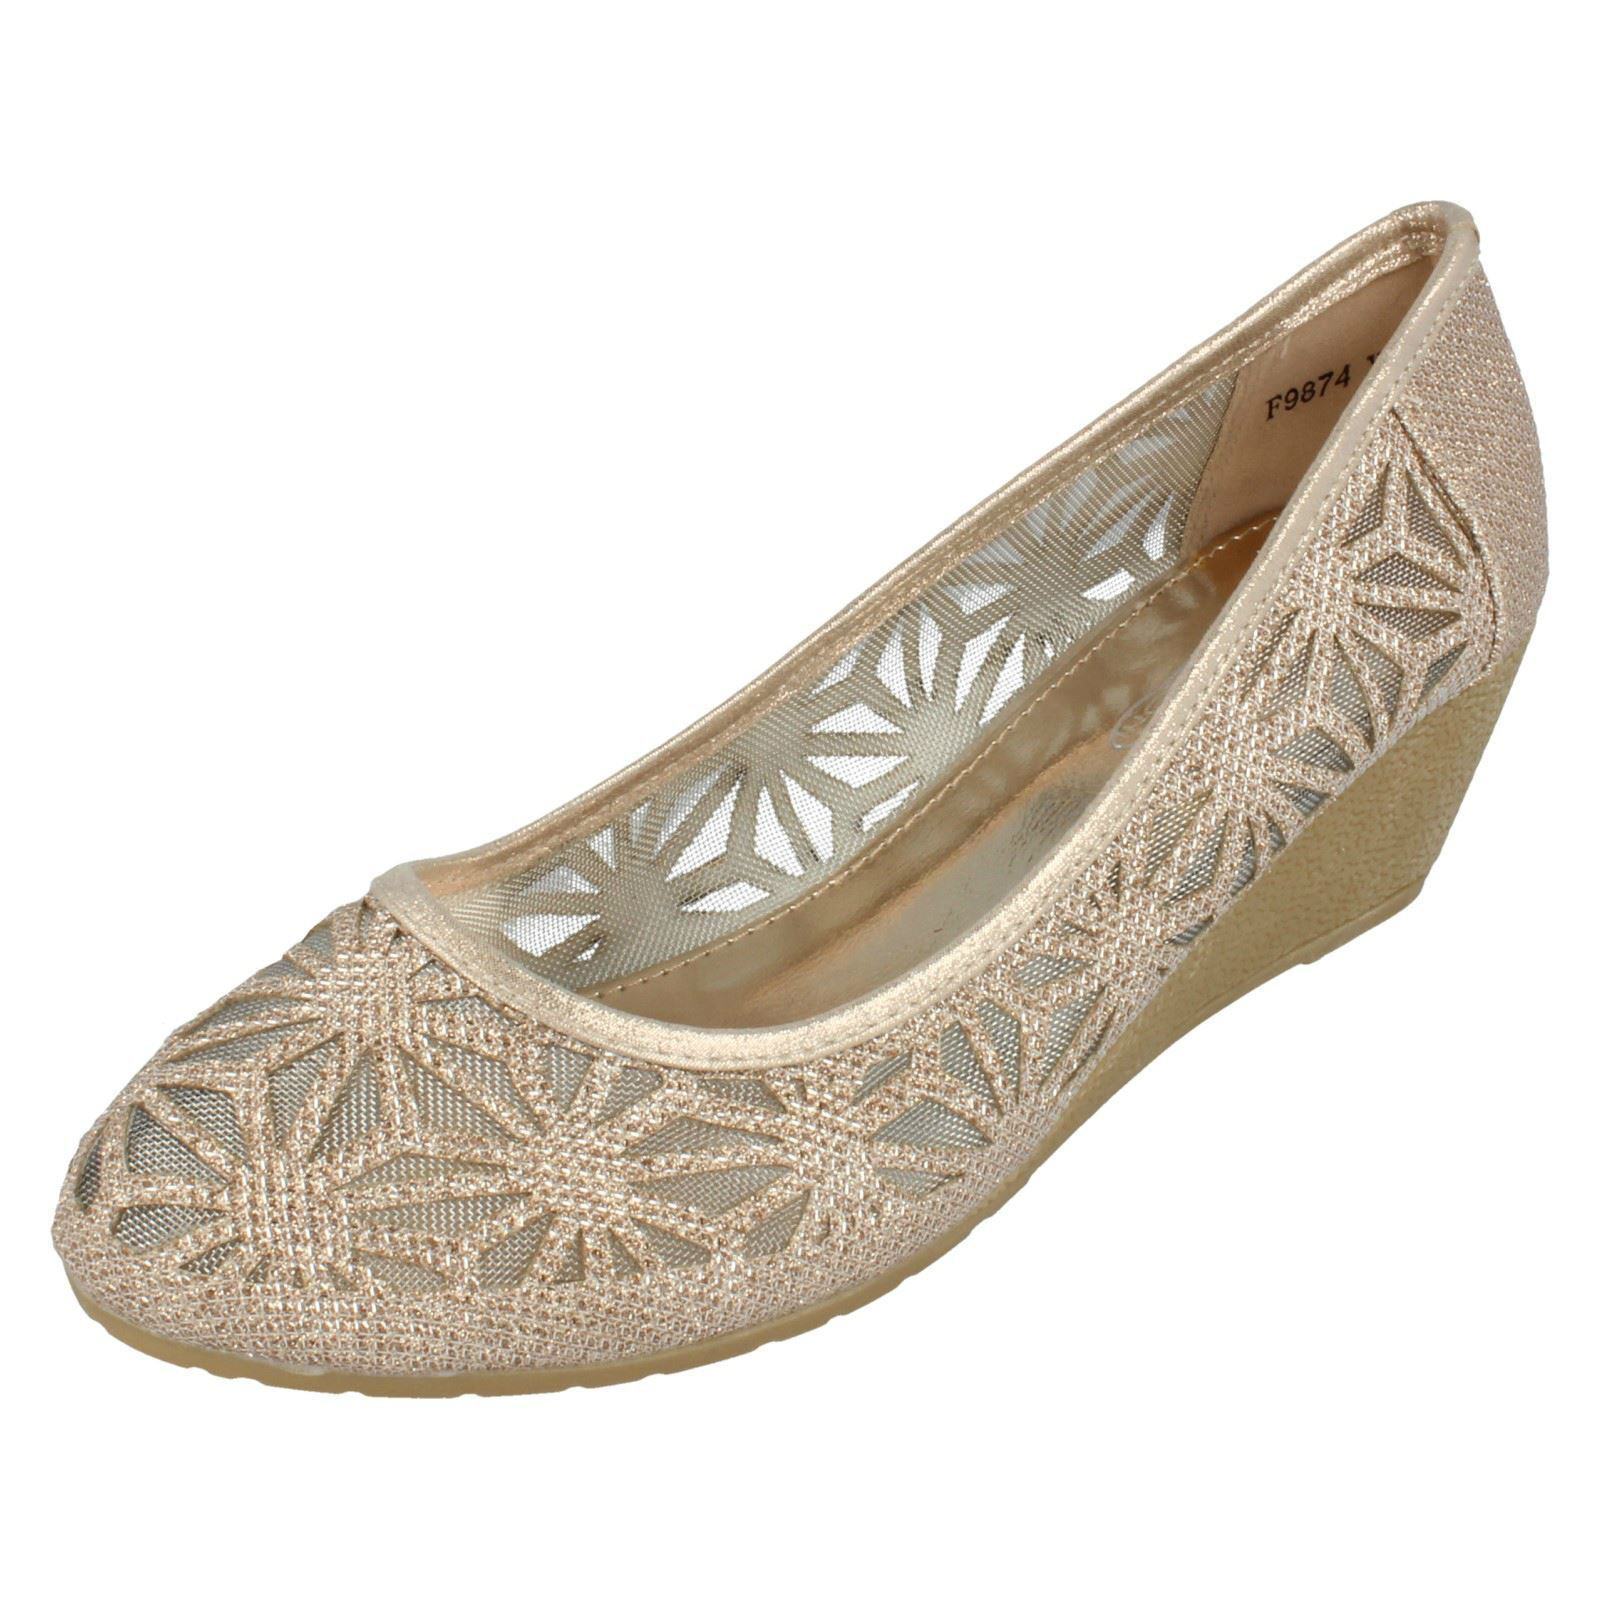 Spot On F9874 Ladies Court Light Gold Glitter Effect Ballerina Court Ladies Shoes ec0fd4